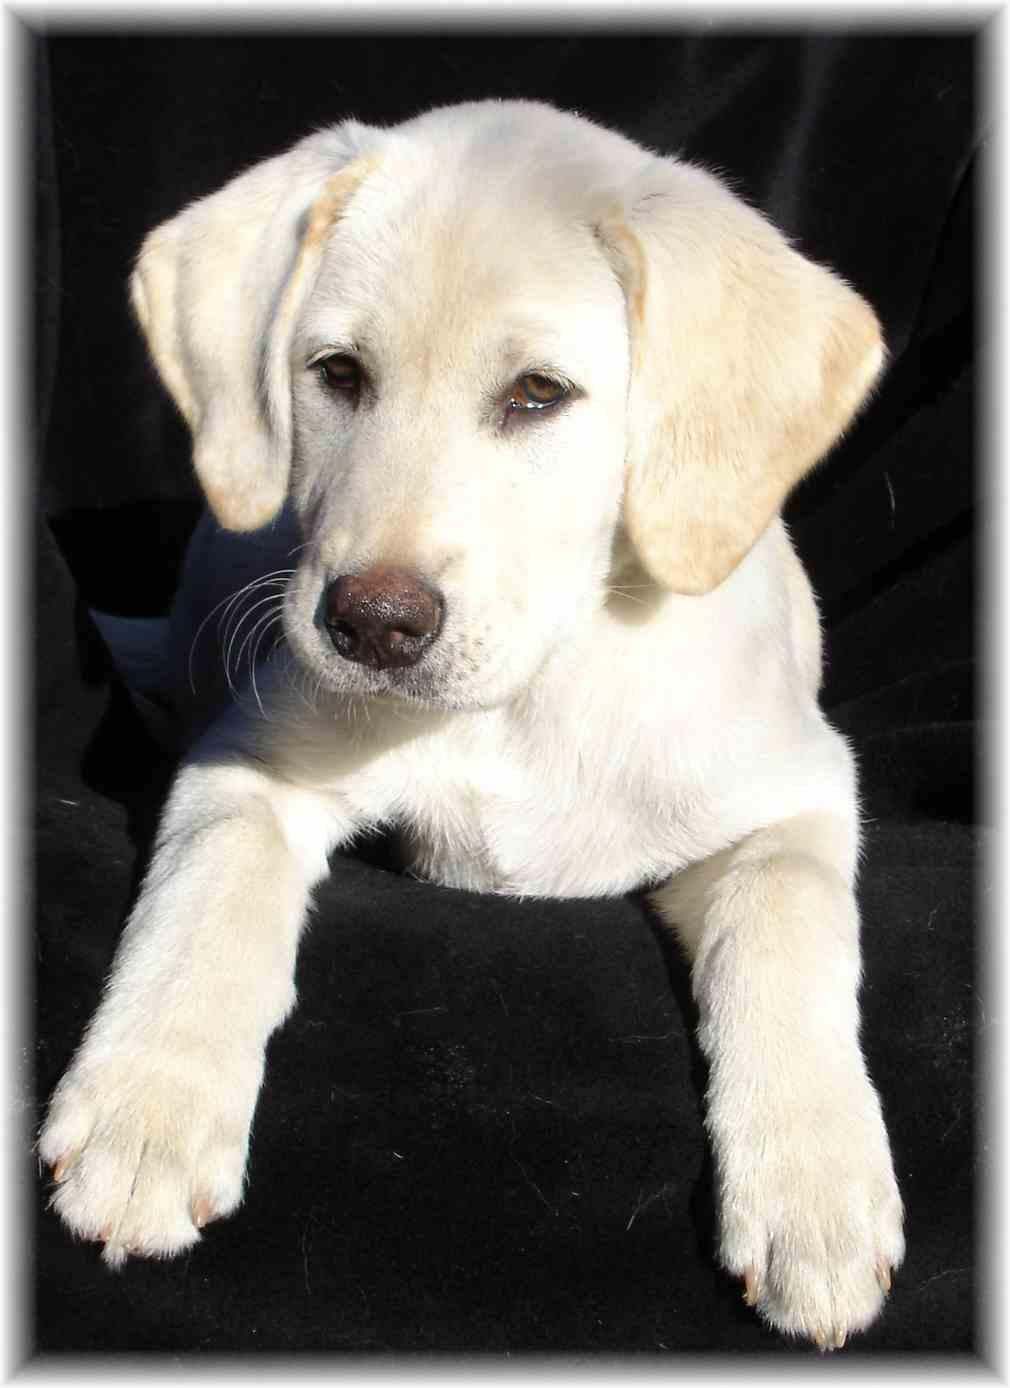 C.A.R.E.S. (Companion Animal Rehabilitation, Education & Sanctuary)